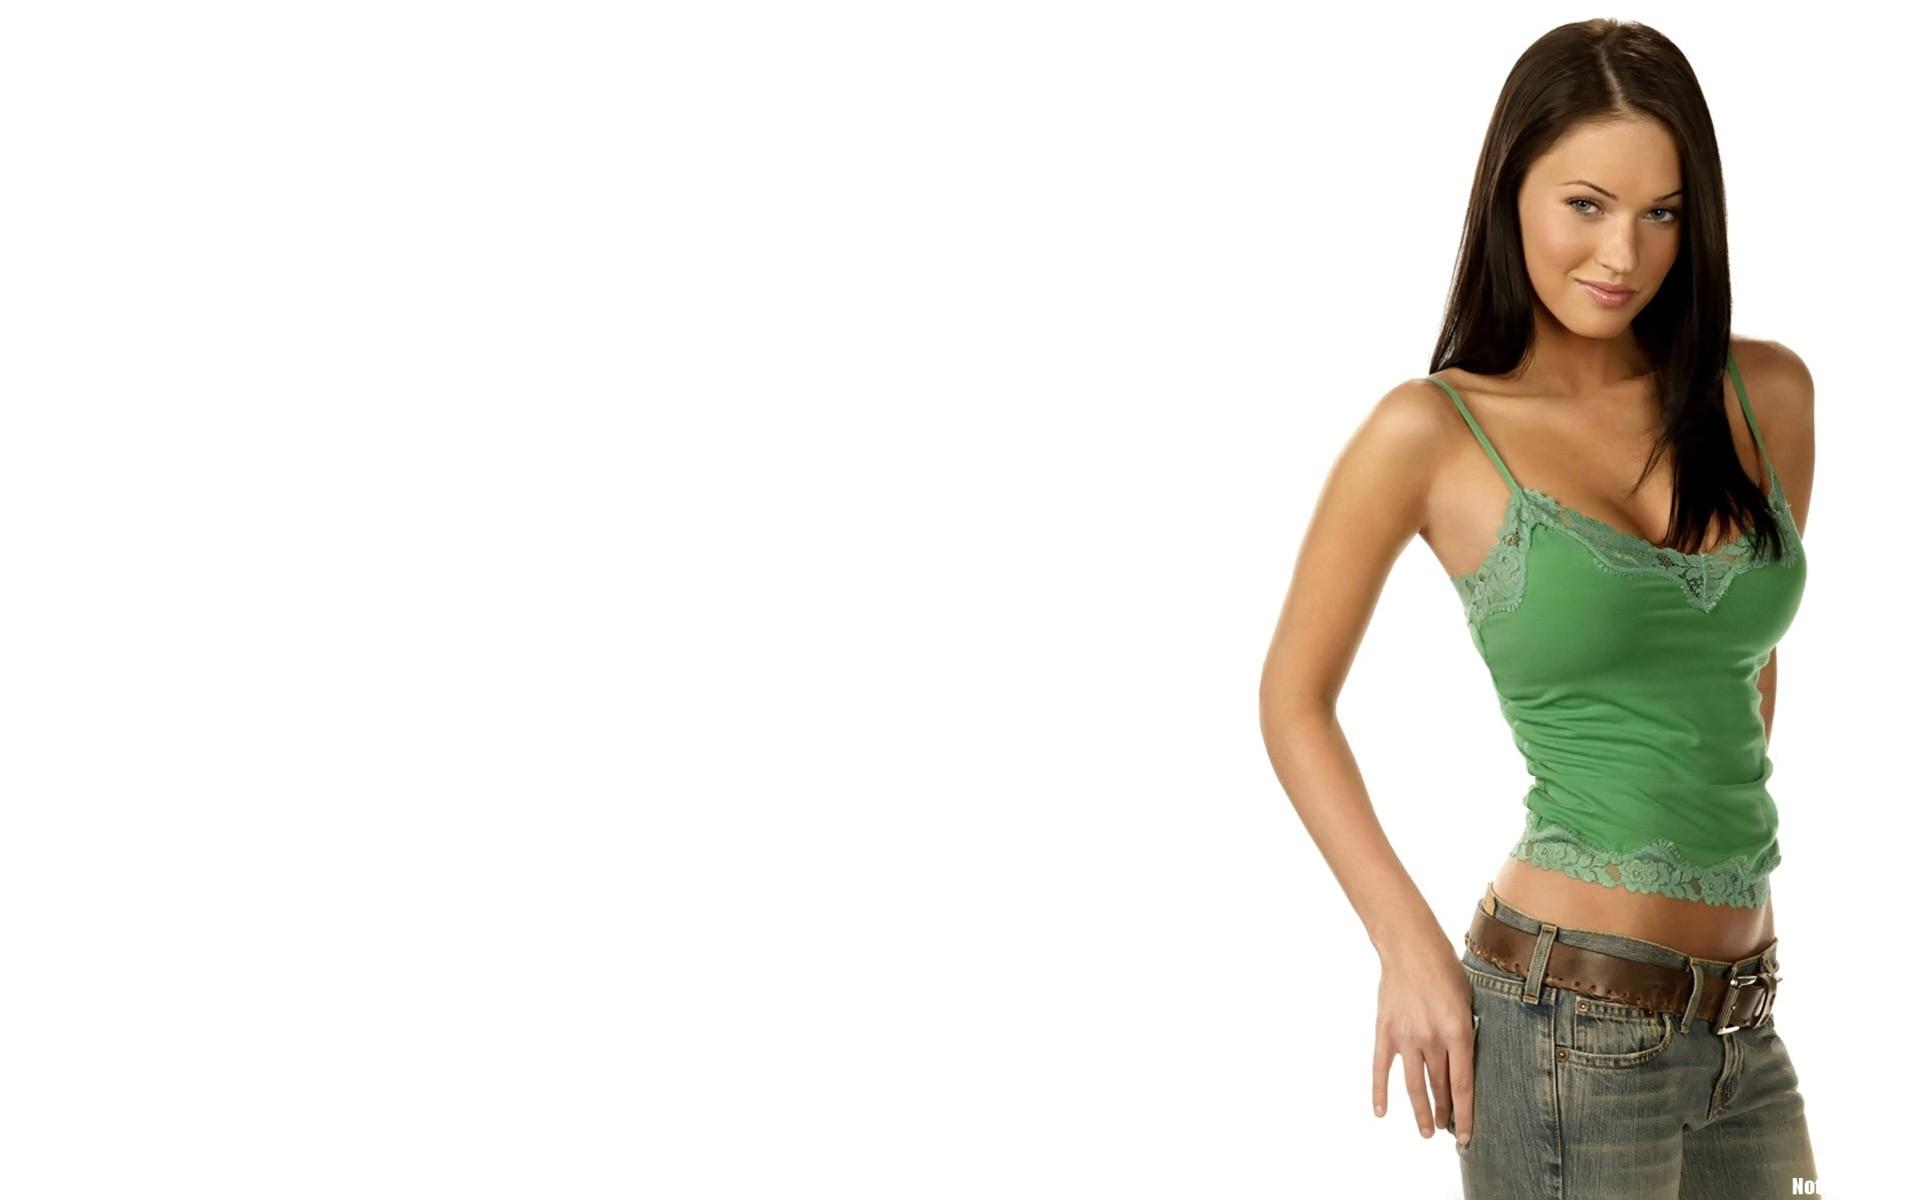 На улице в прозрачном фоне девушка грудь, порно фото девушек крупно очень